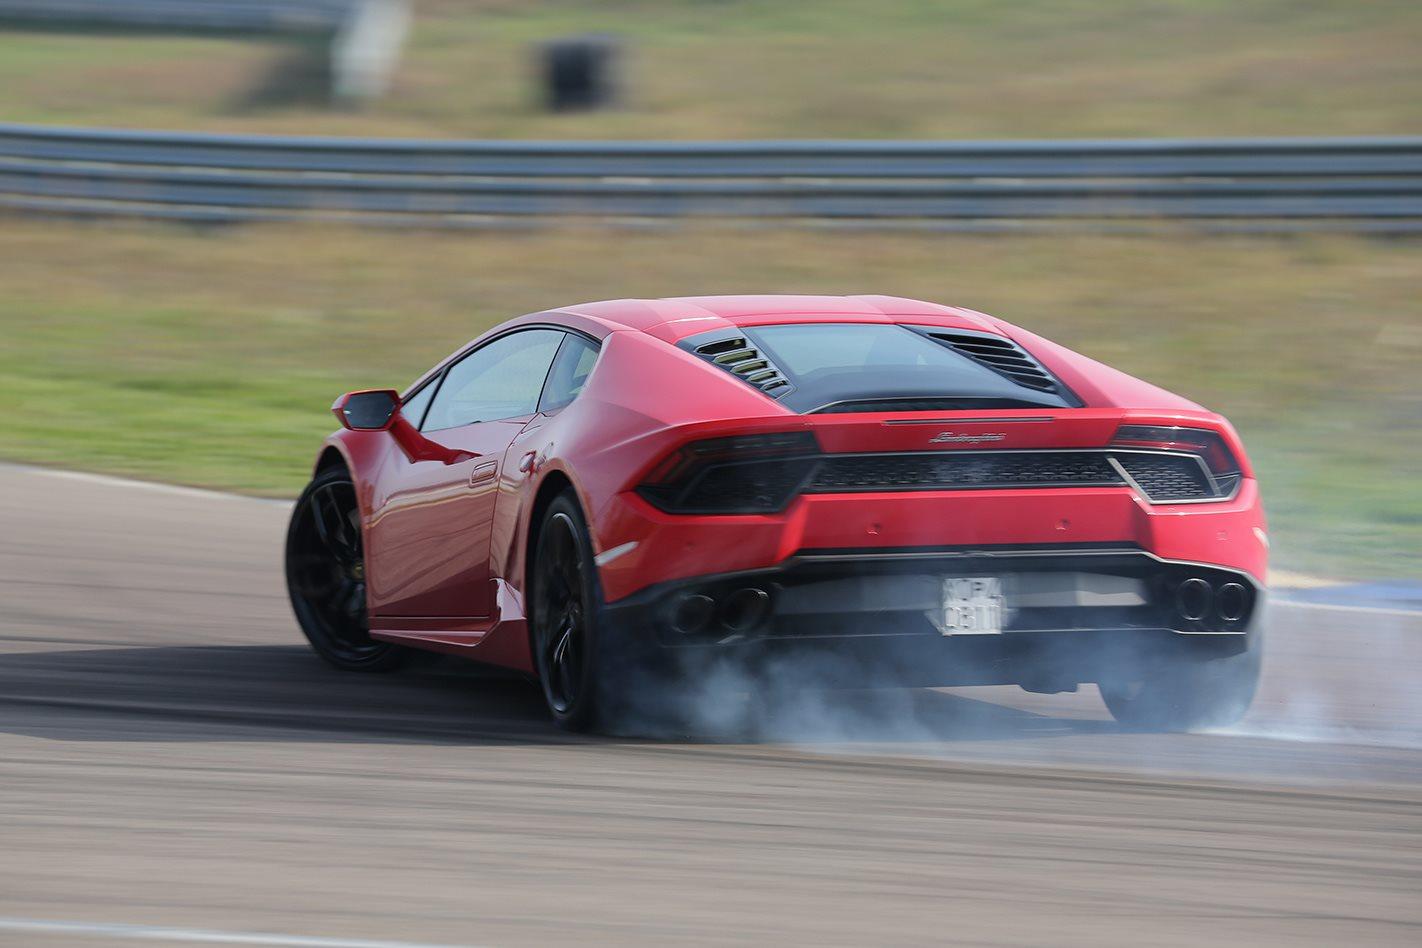 Best Sounding Car Of 2016 Lamborghini Huracan Lp580 2